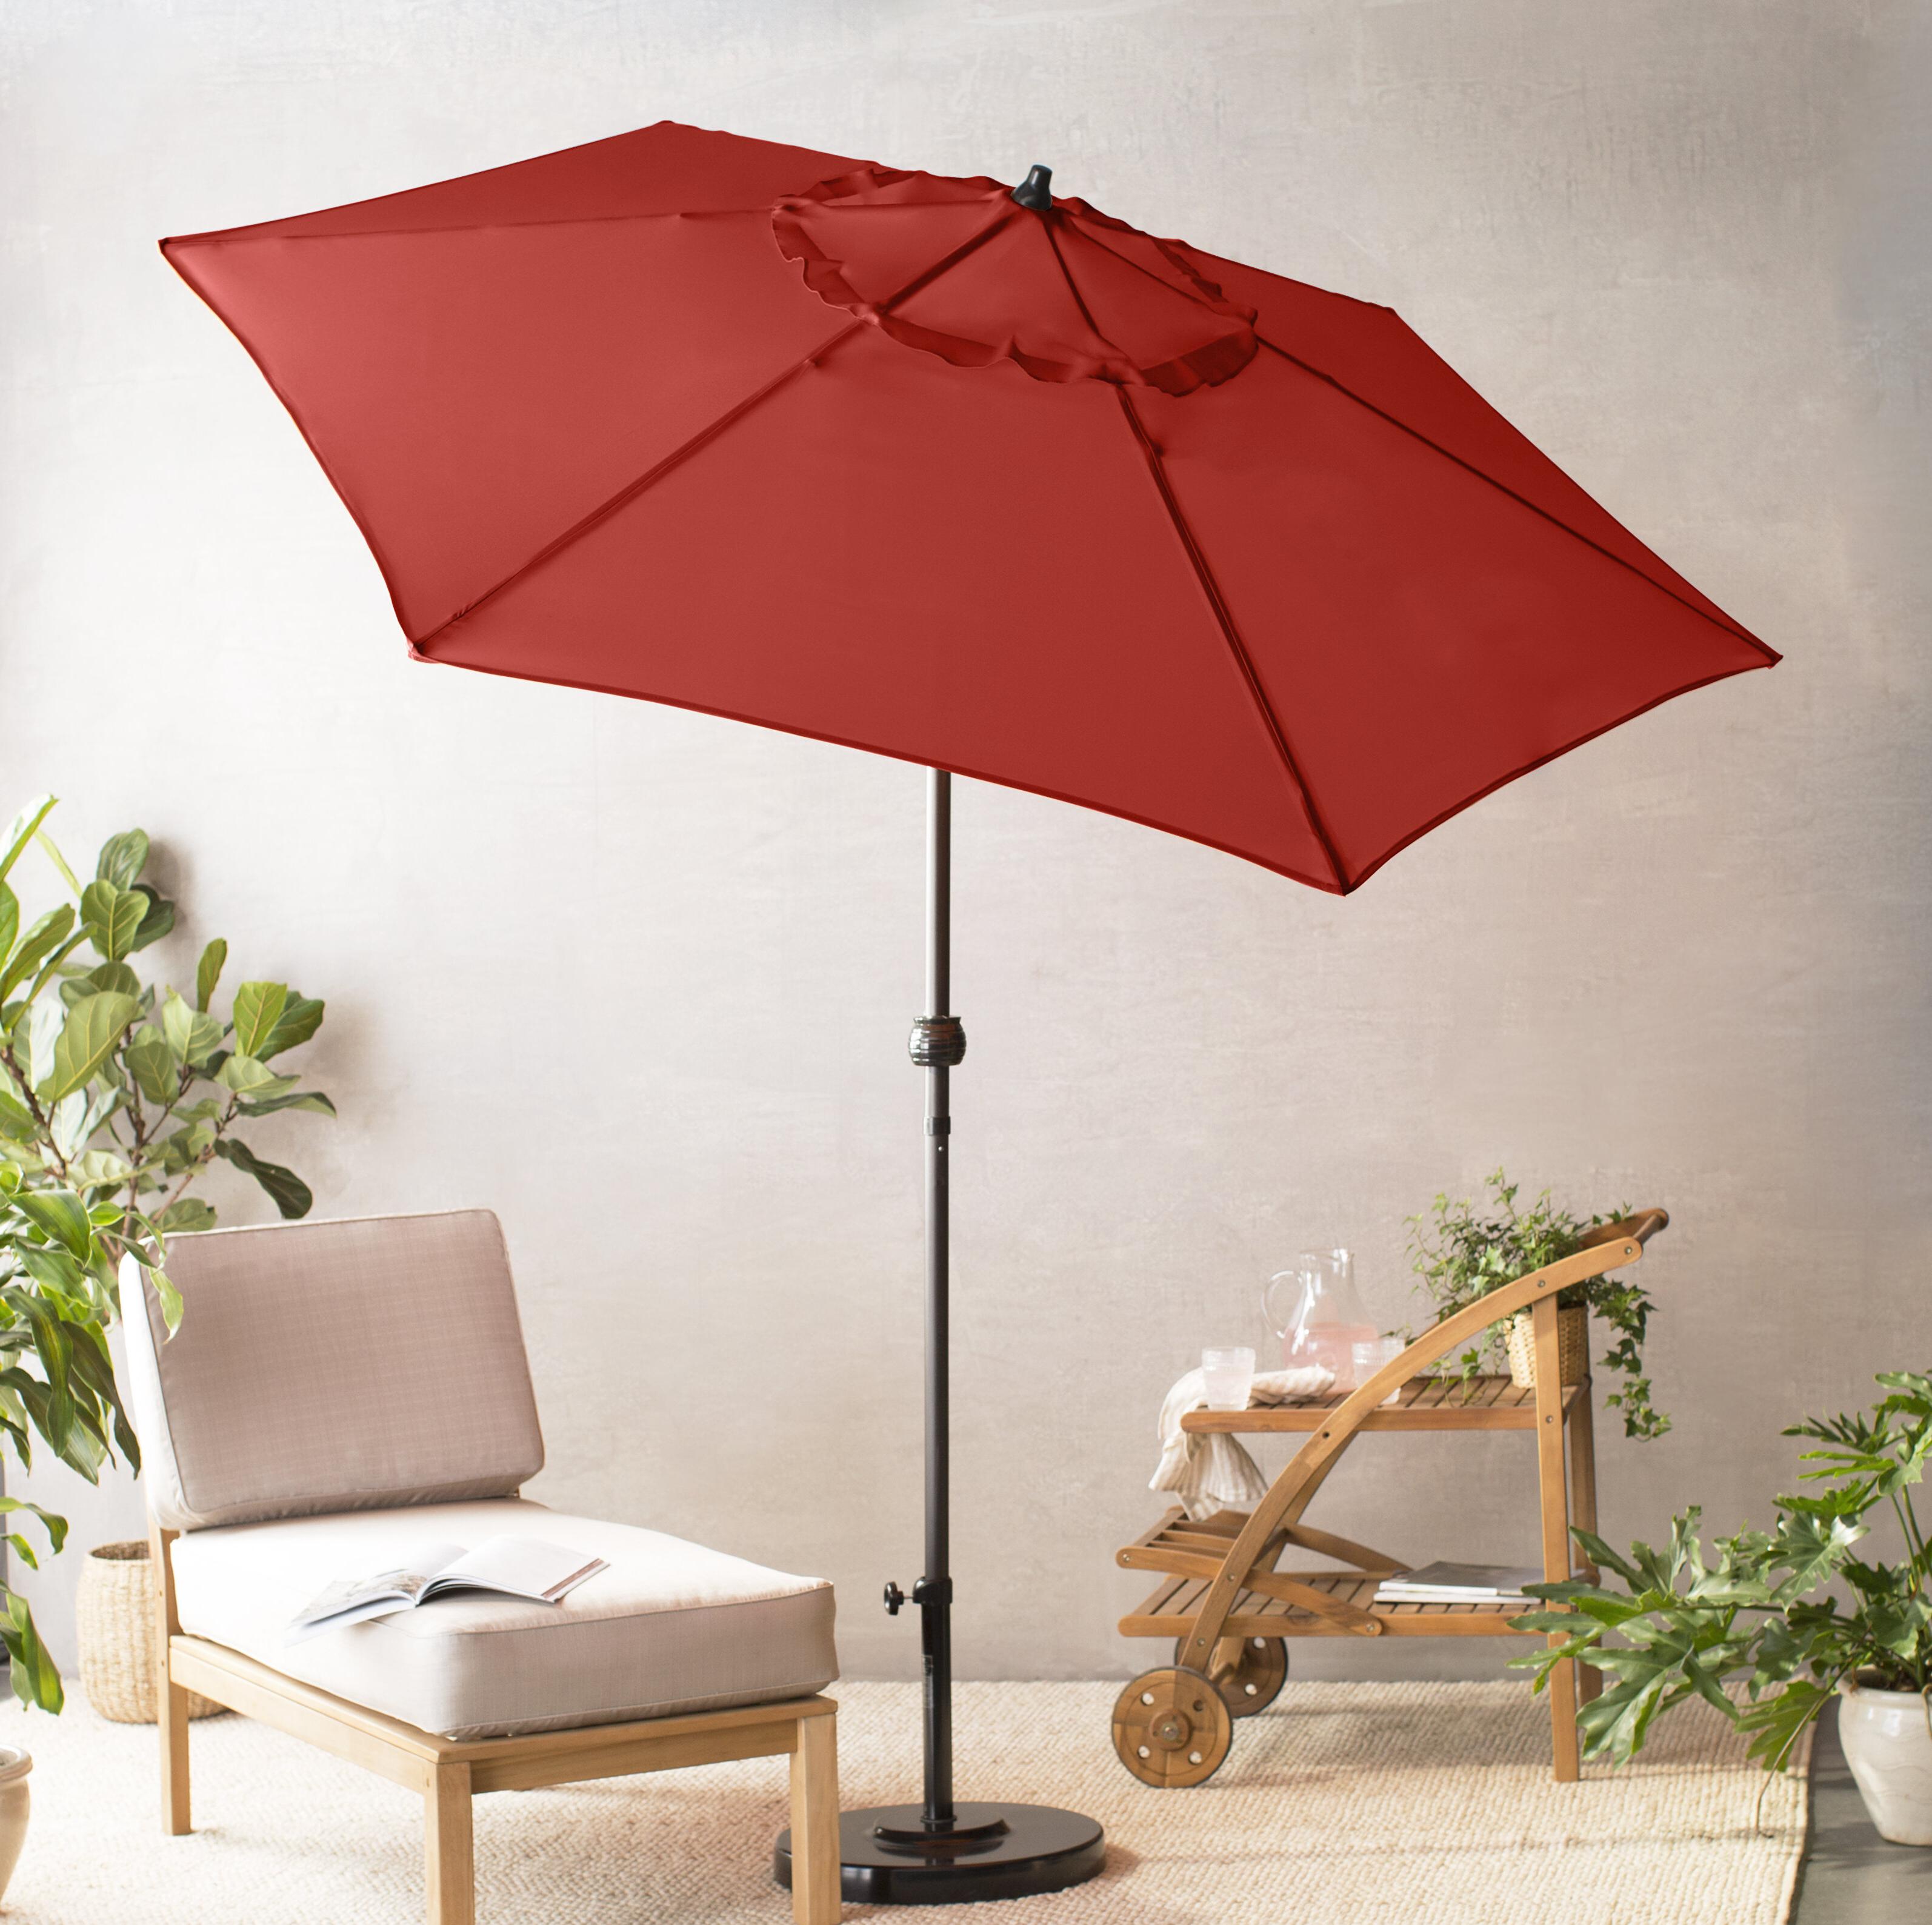 Kearney 9' Market Umbrella For Most Recent Kelton Market Umbrellas (View 5 of 20)